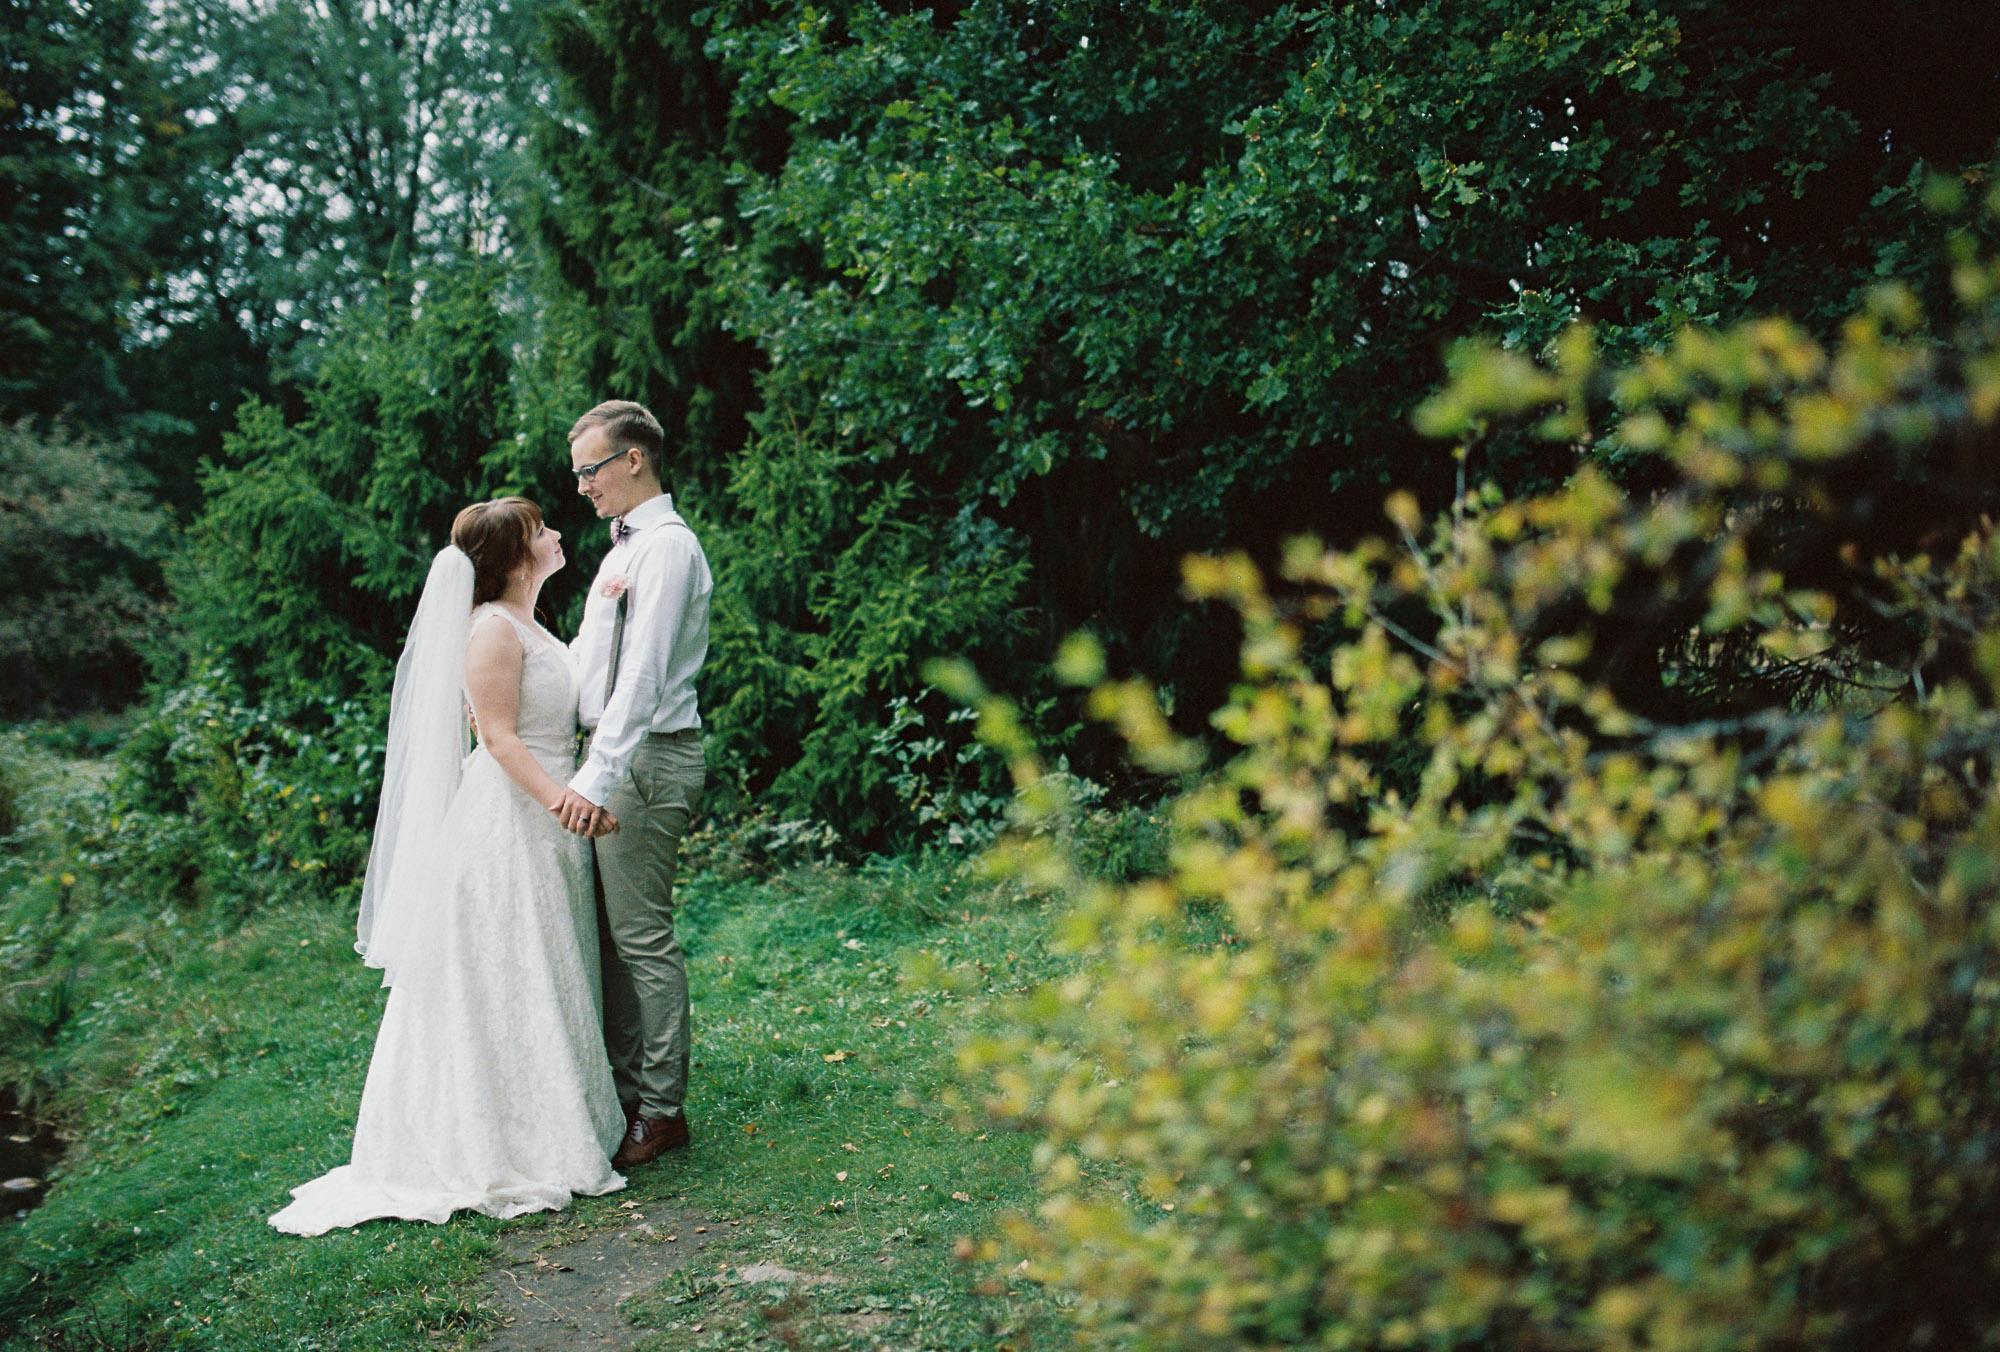 jere-satamo-analog-film-wedding-photographer-finland-099.jpg